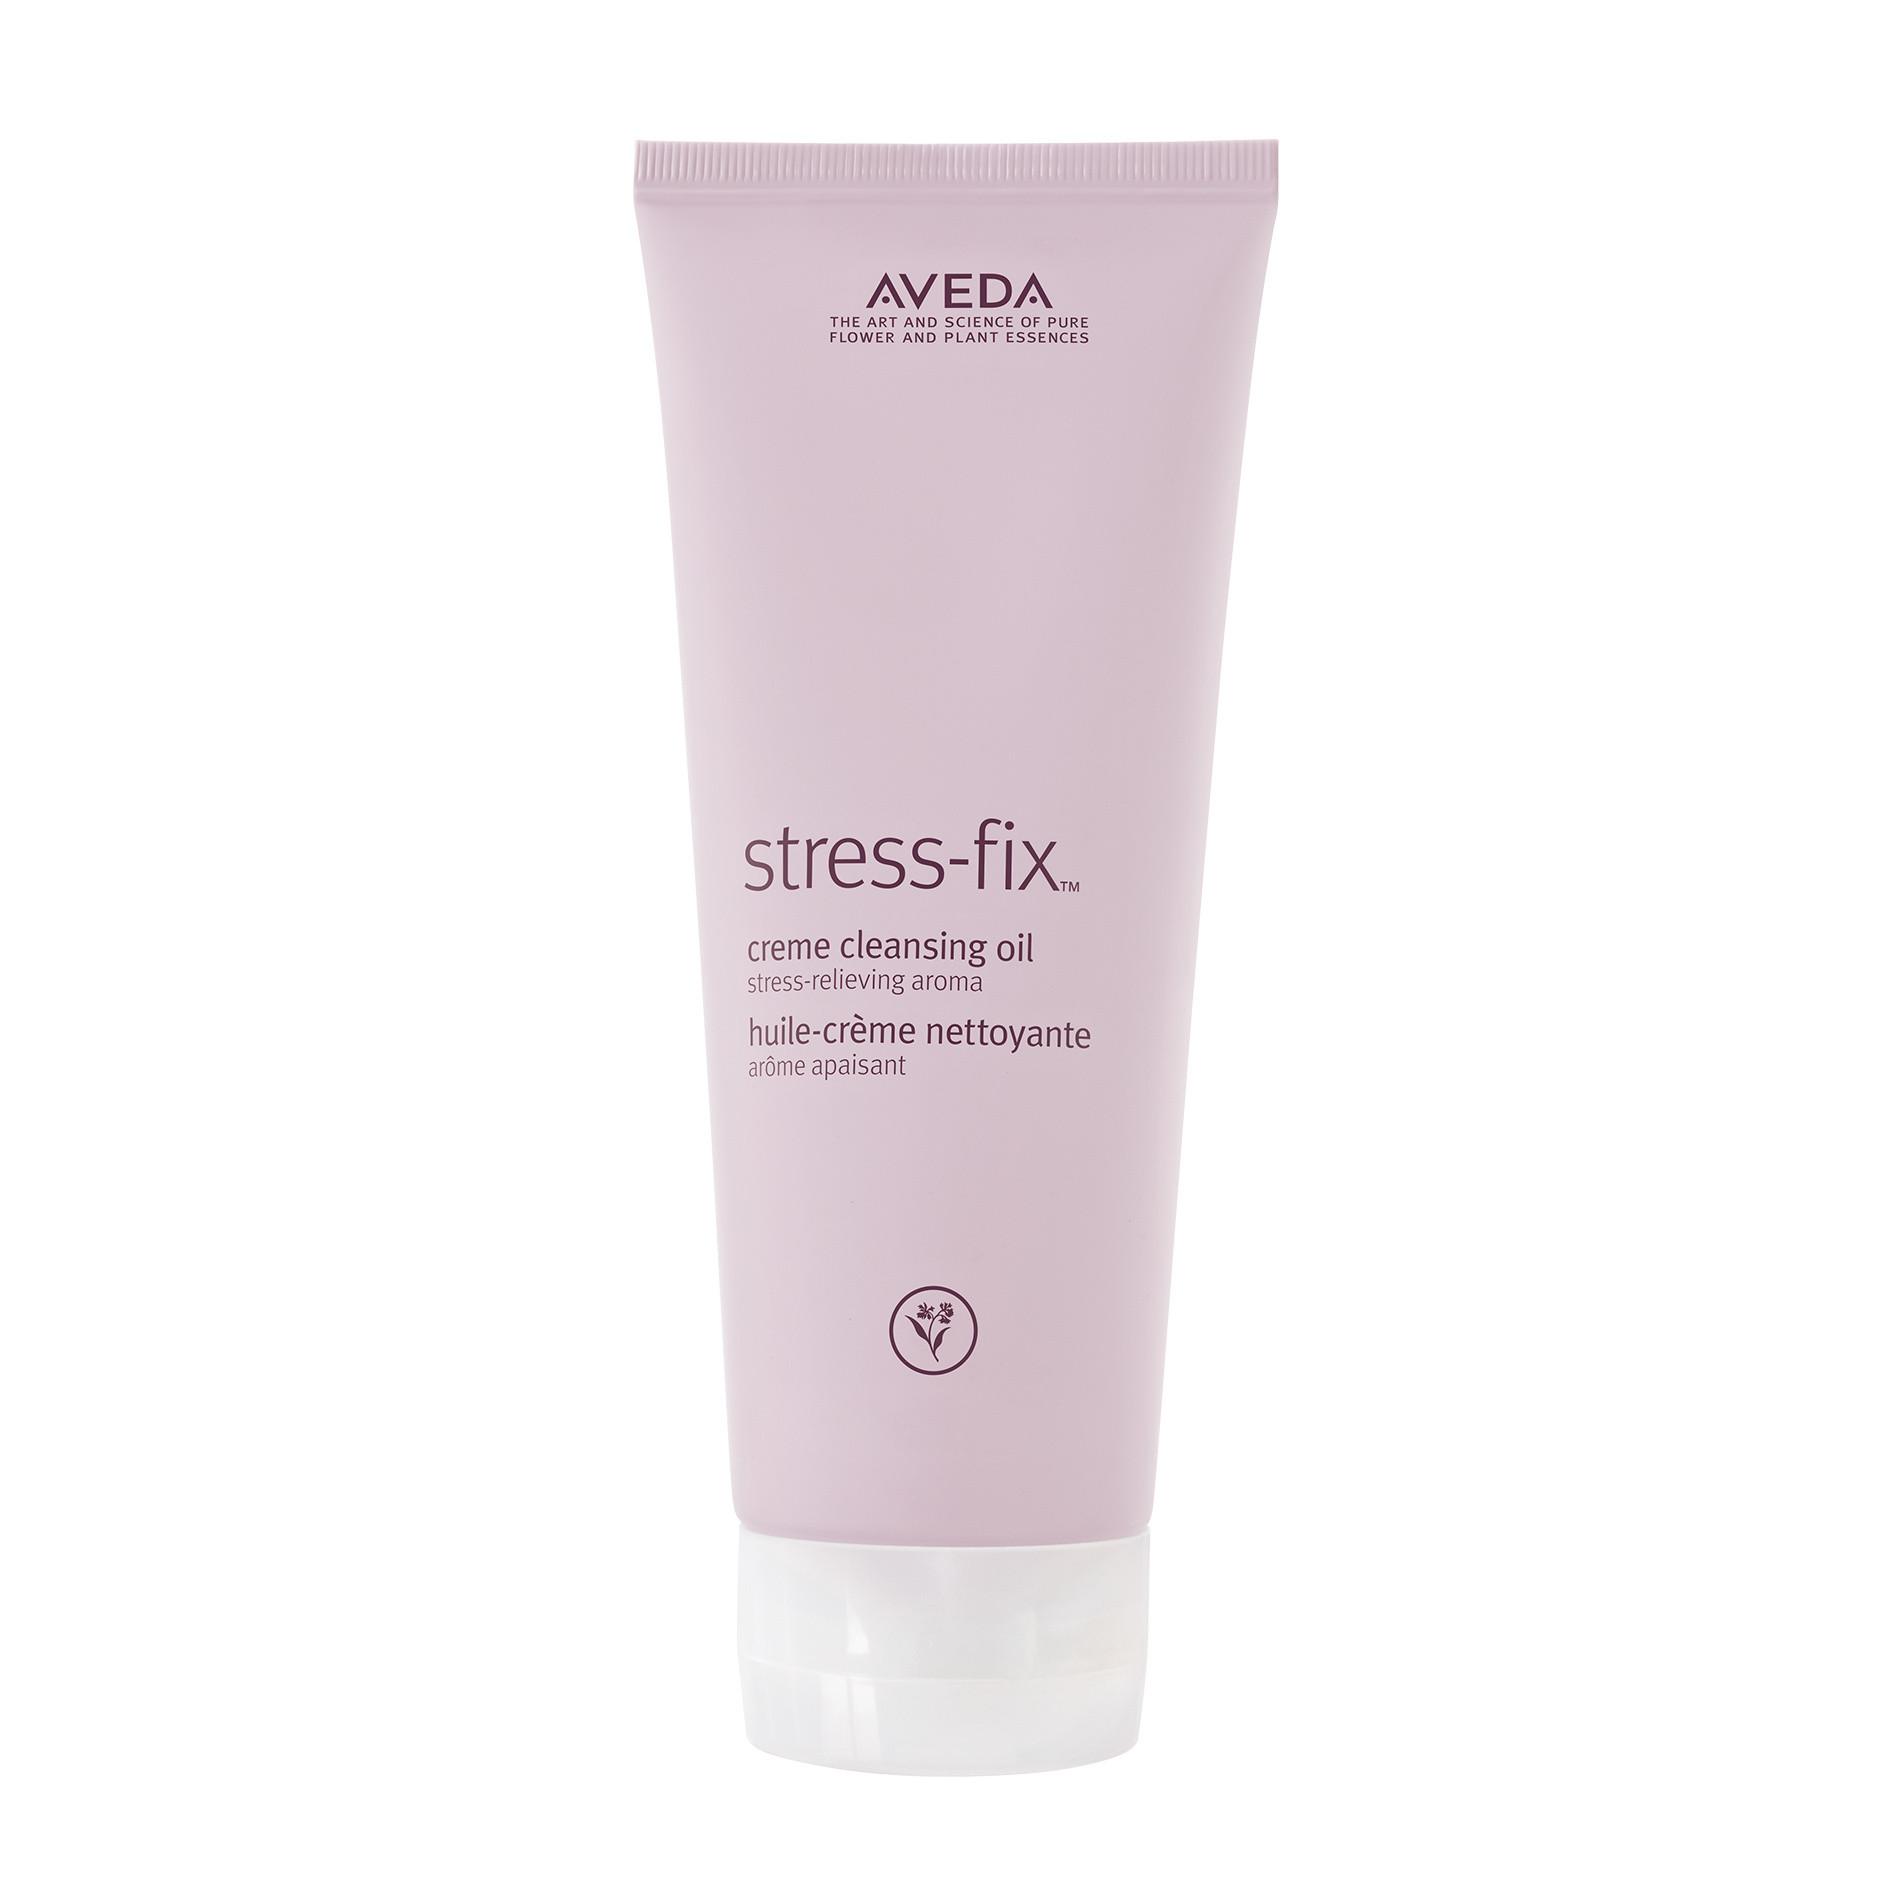 Aveda stress-fix olio detergente 200 ml, Viola, large image number 0